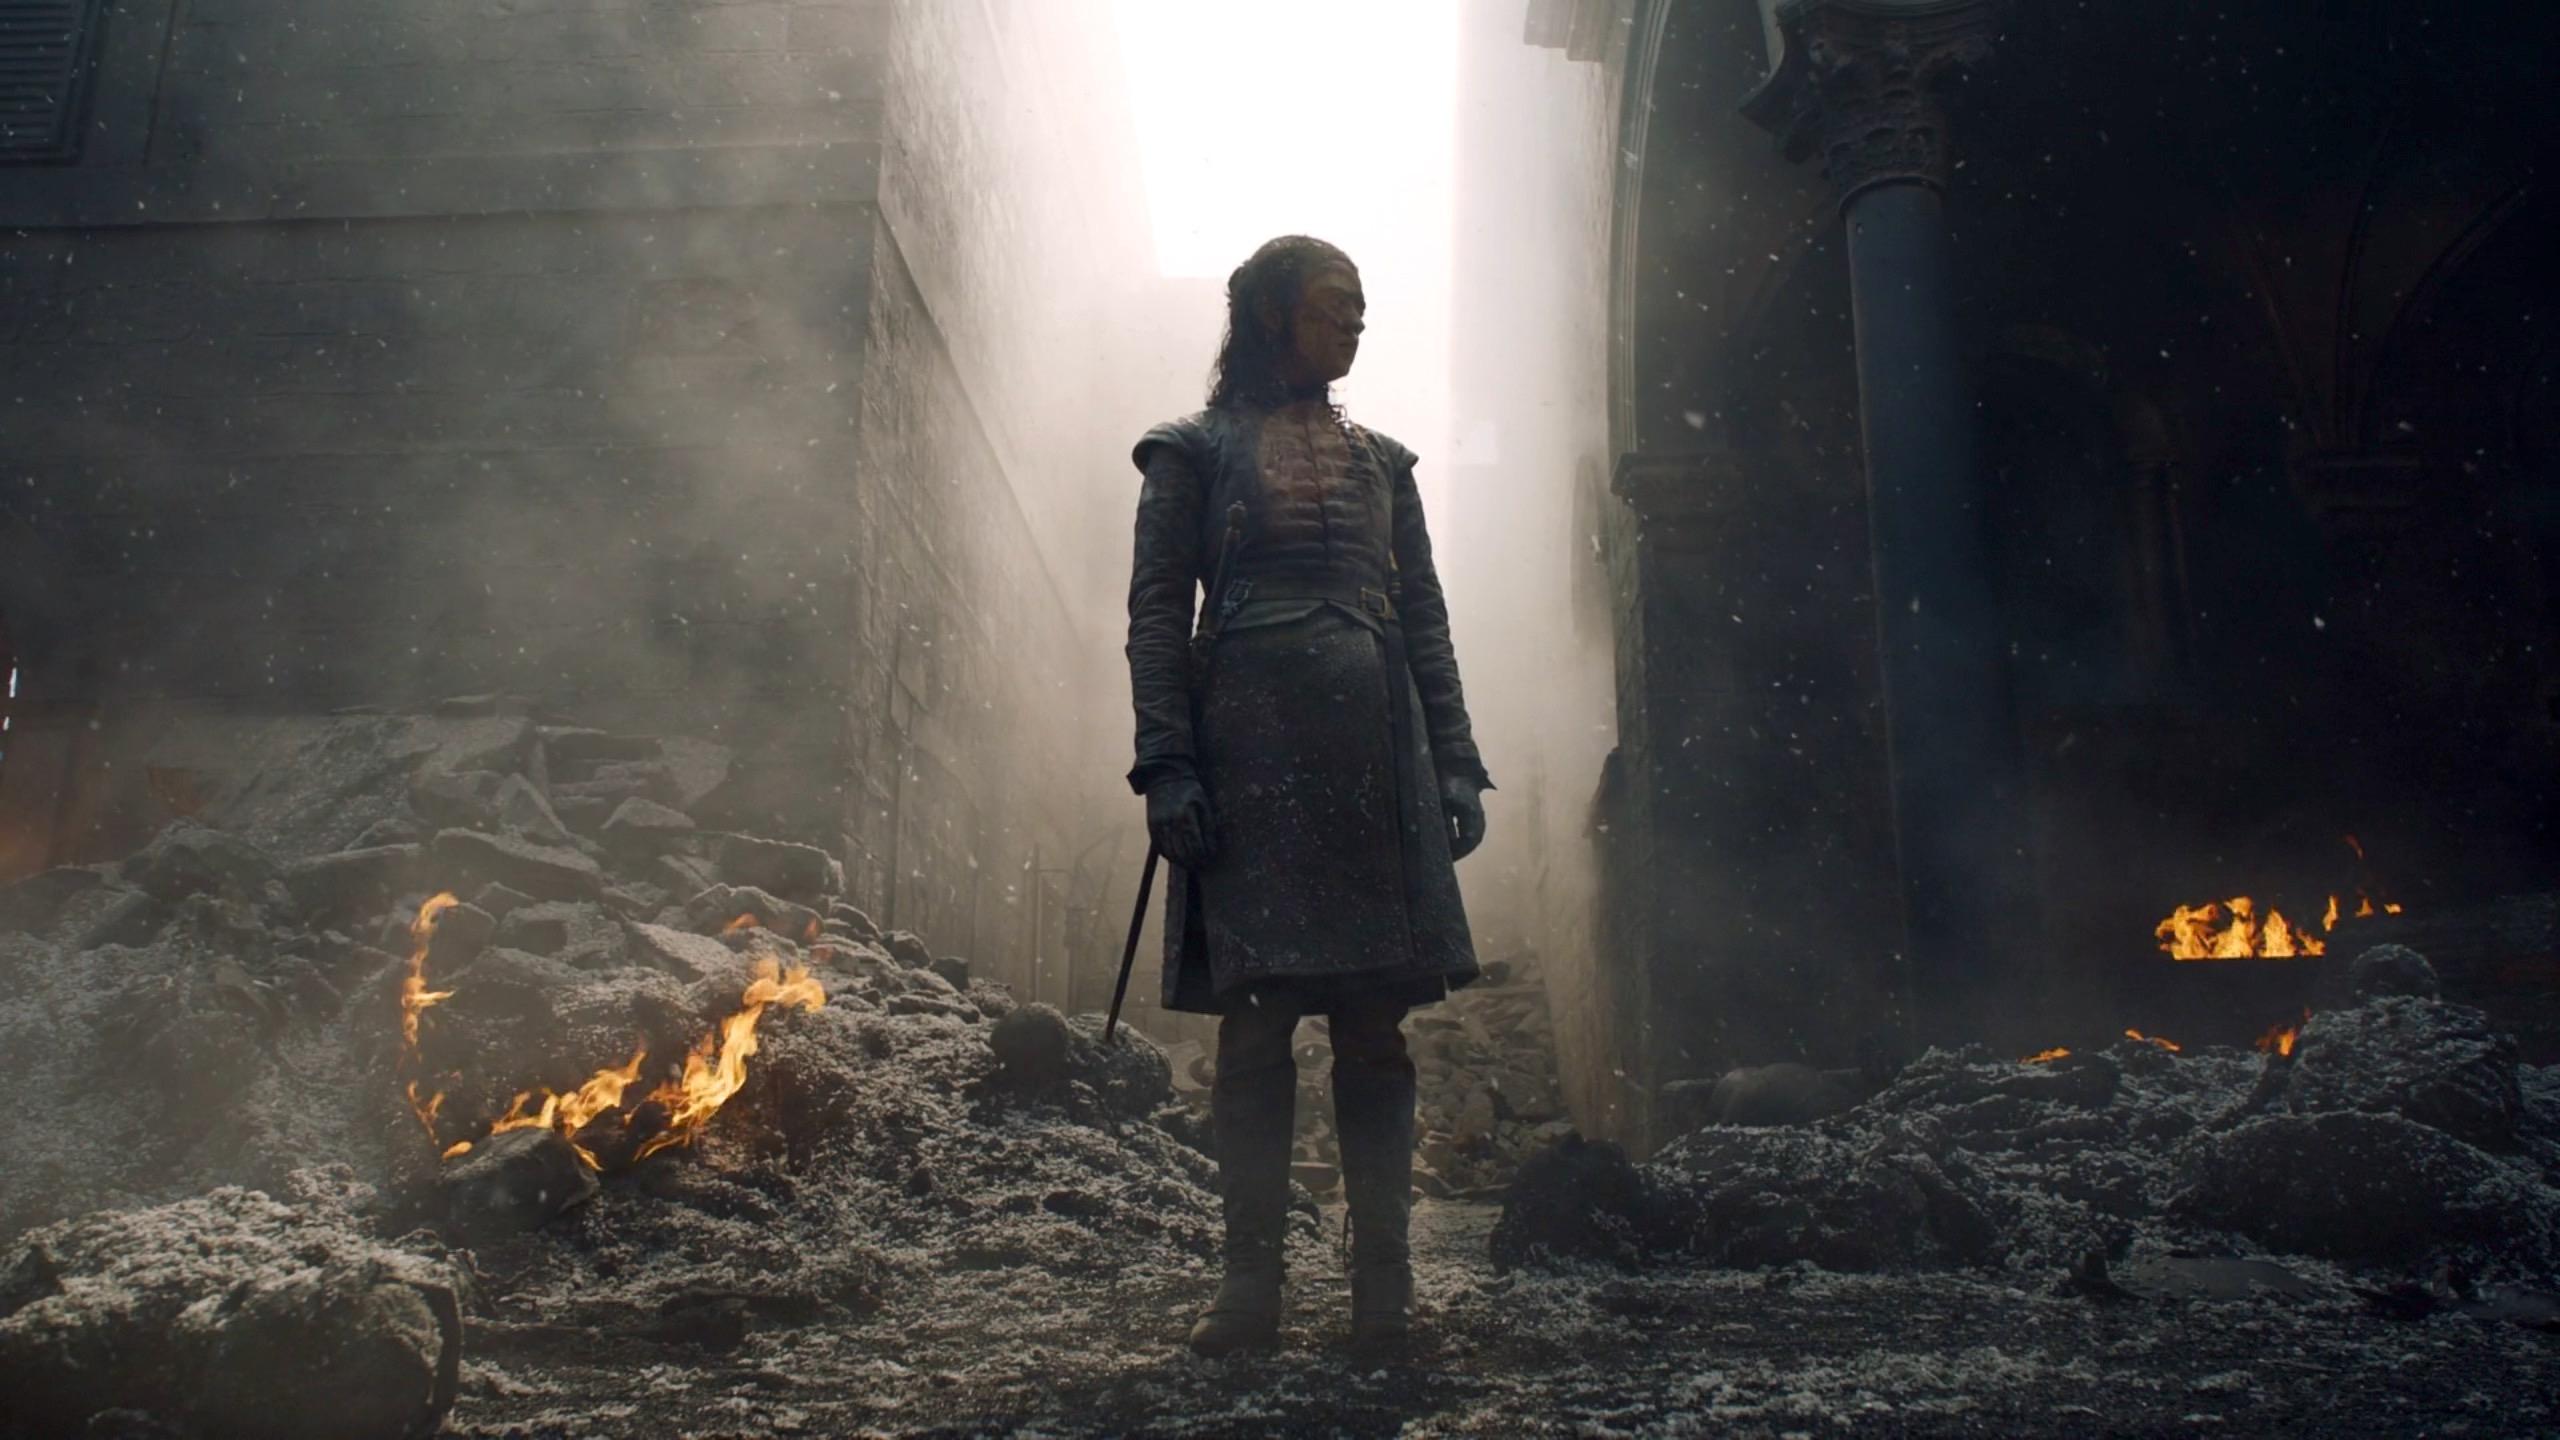 Arya Stark in Game of Thrones 8x05 - The Bells